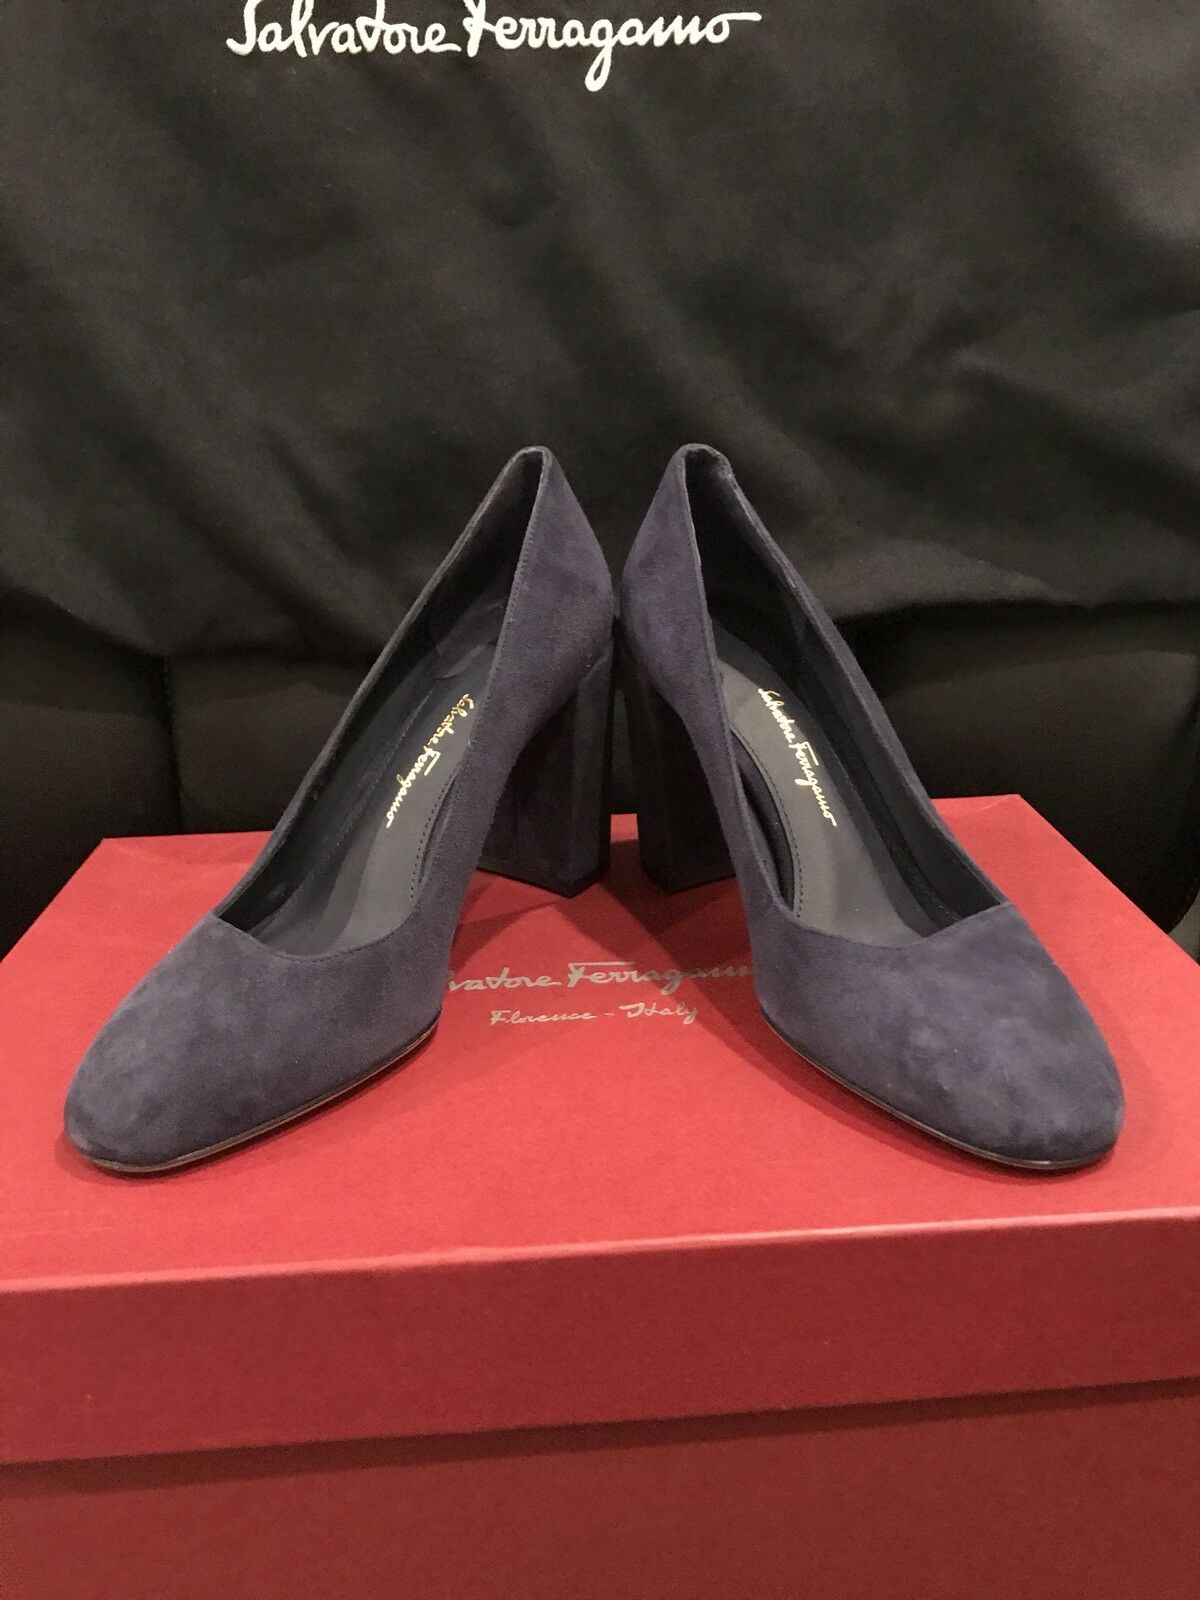 Salvatore Ferragamo Arezzo 85 Mirto bluee Suede Womens shoes Sz. 6 B NIB